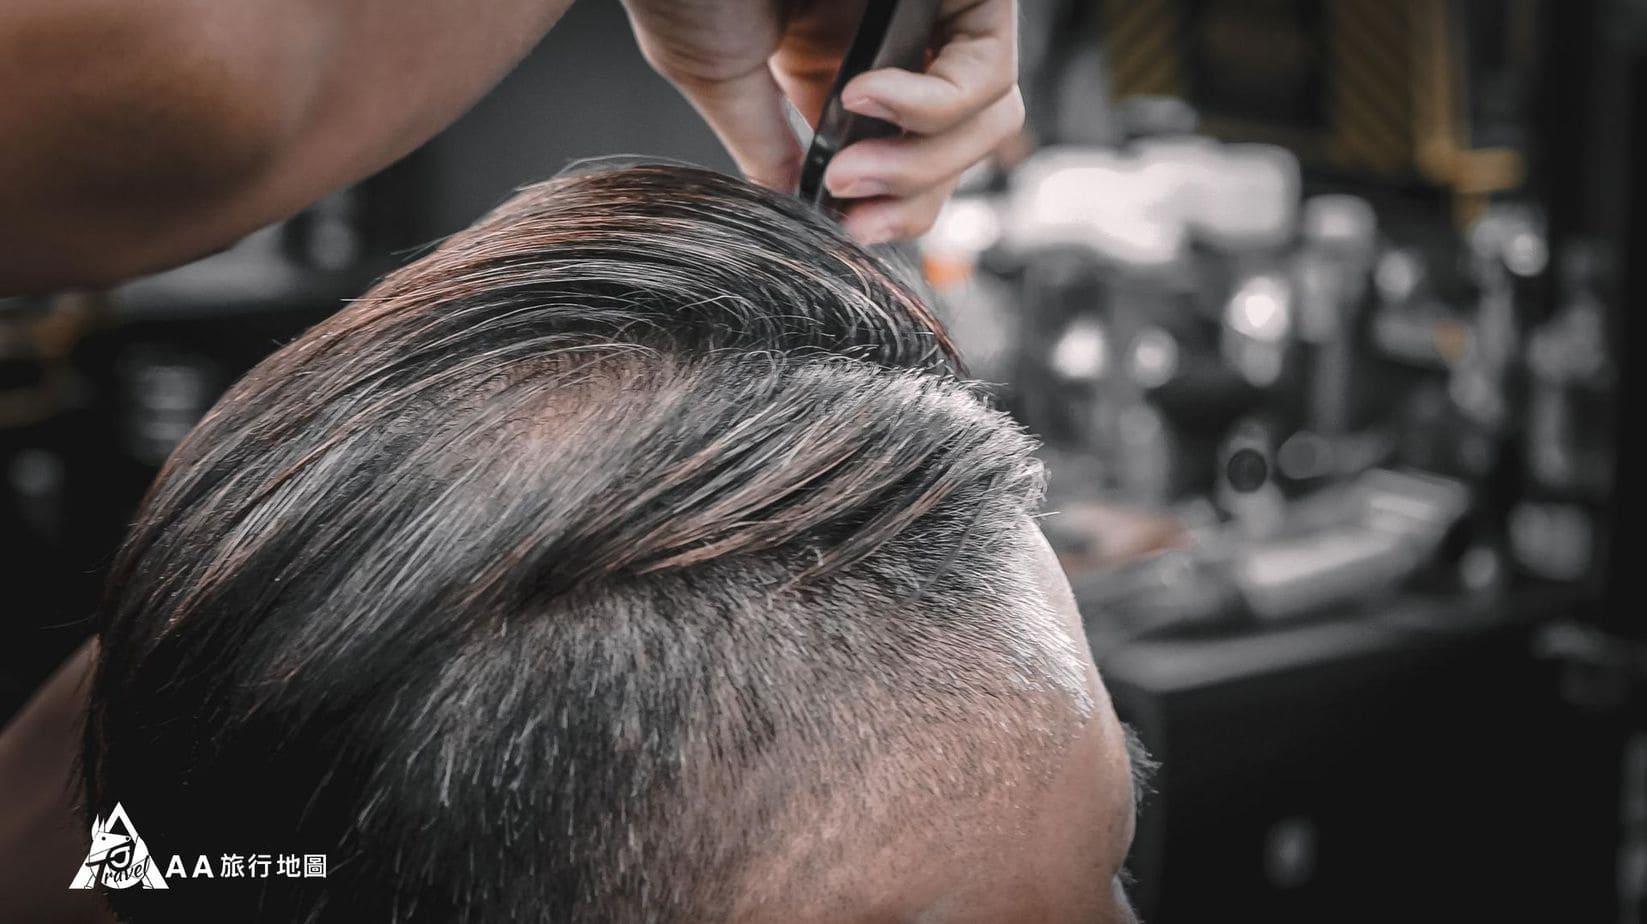 HomeComing 第一次有理髮師告訴我原來還可以這樣小分線